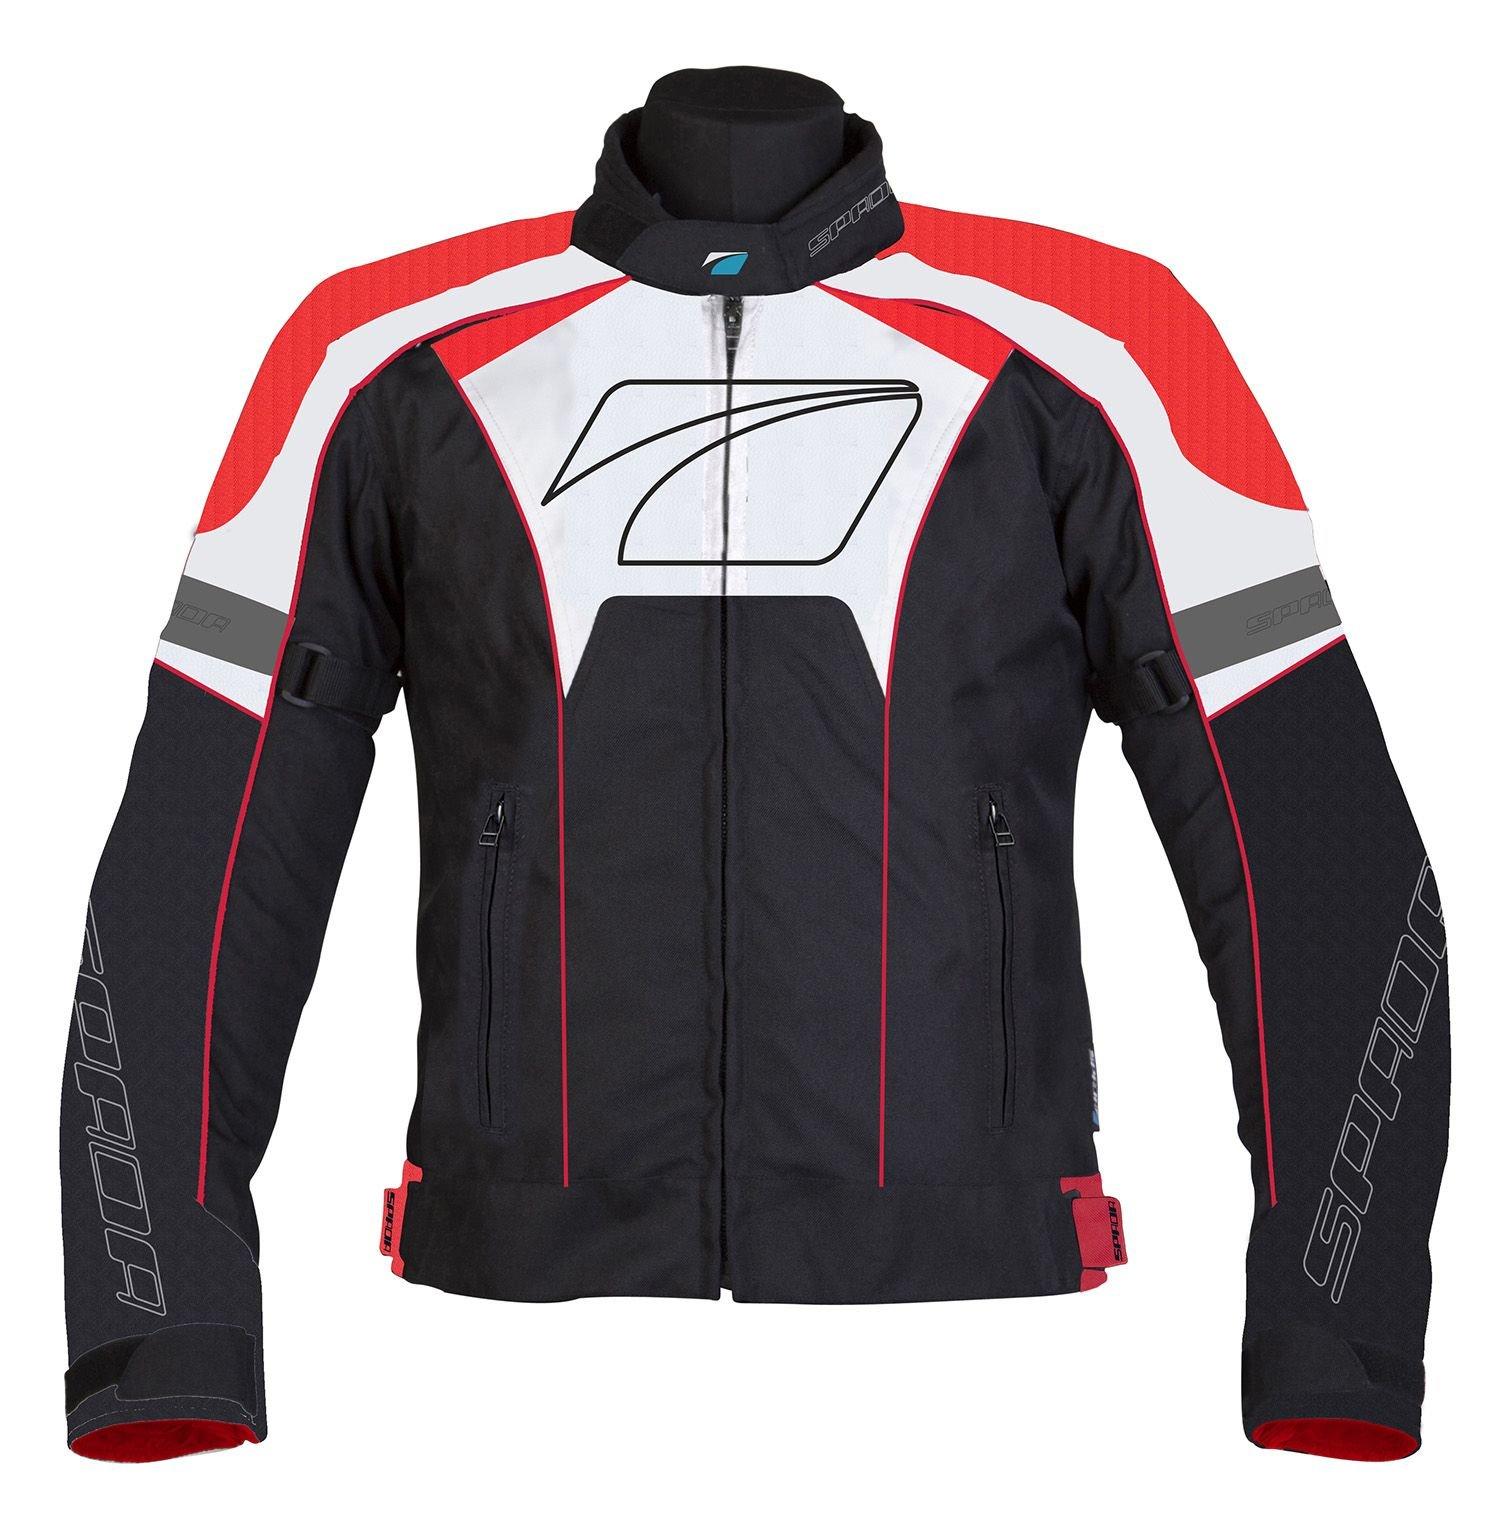 Spada Burnout Sports Textile Waterproof Motorcycle Jacket - Black/Red/White L by Spada